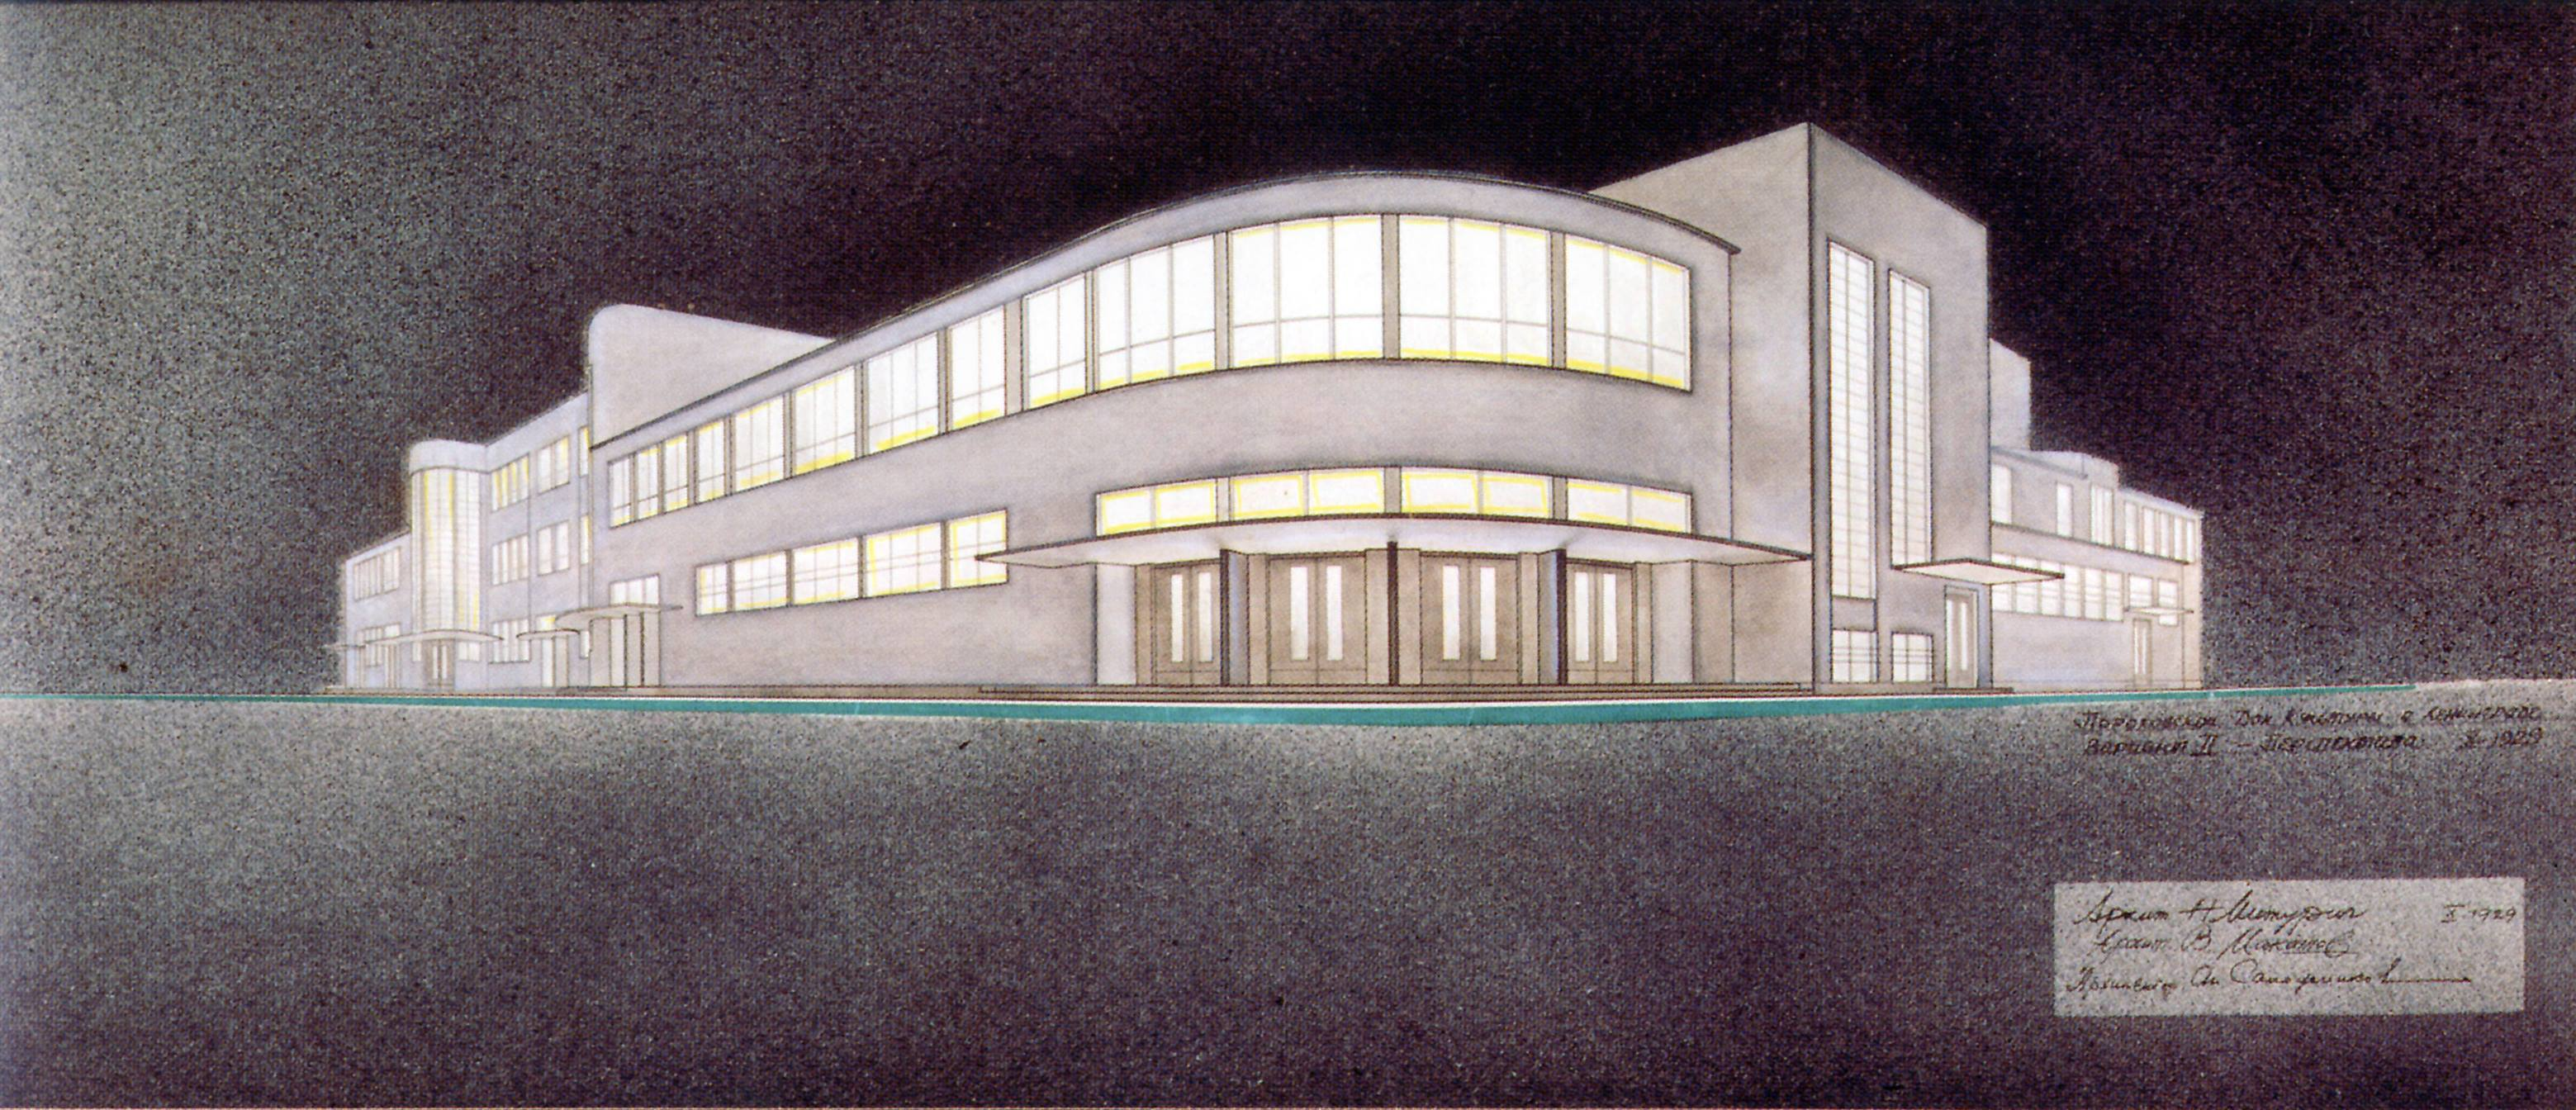 Porokhovskoy Recreation Center (House of Culture) : Leningrad :: N. A. Miturich, V. P. Makashov, etc. : Design :: Second Variant : Perspective view Watercolors, airbrush on paper: 1929